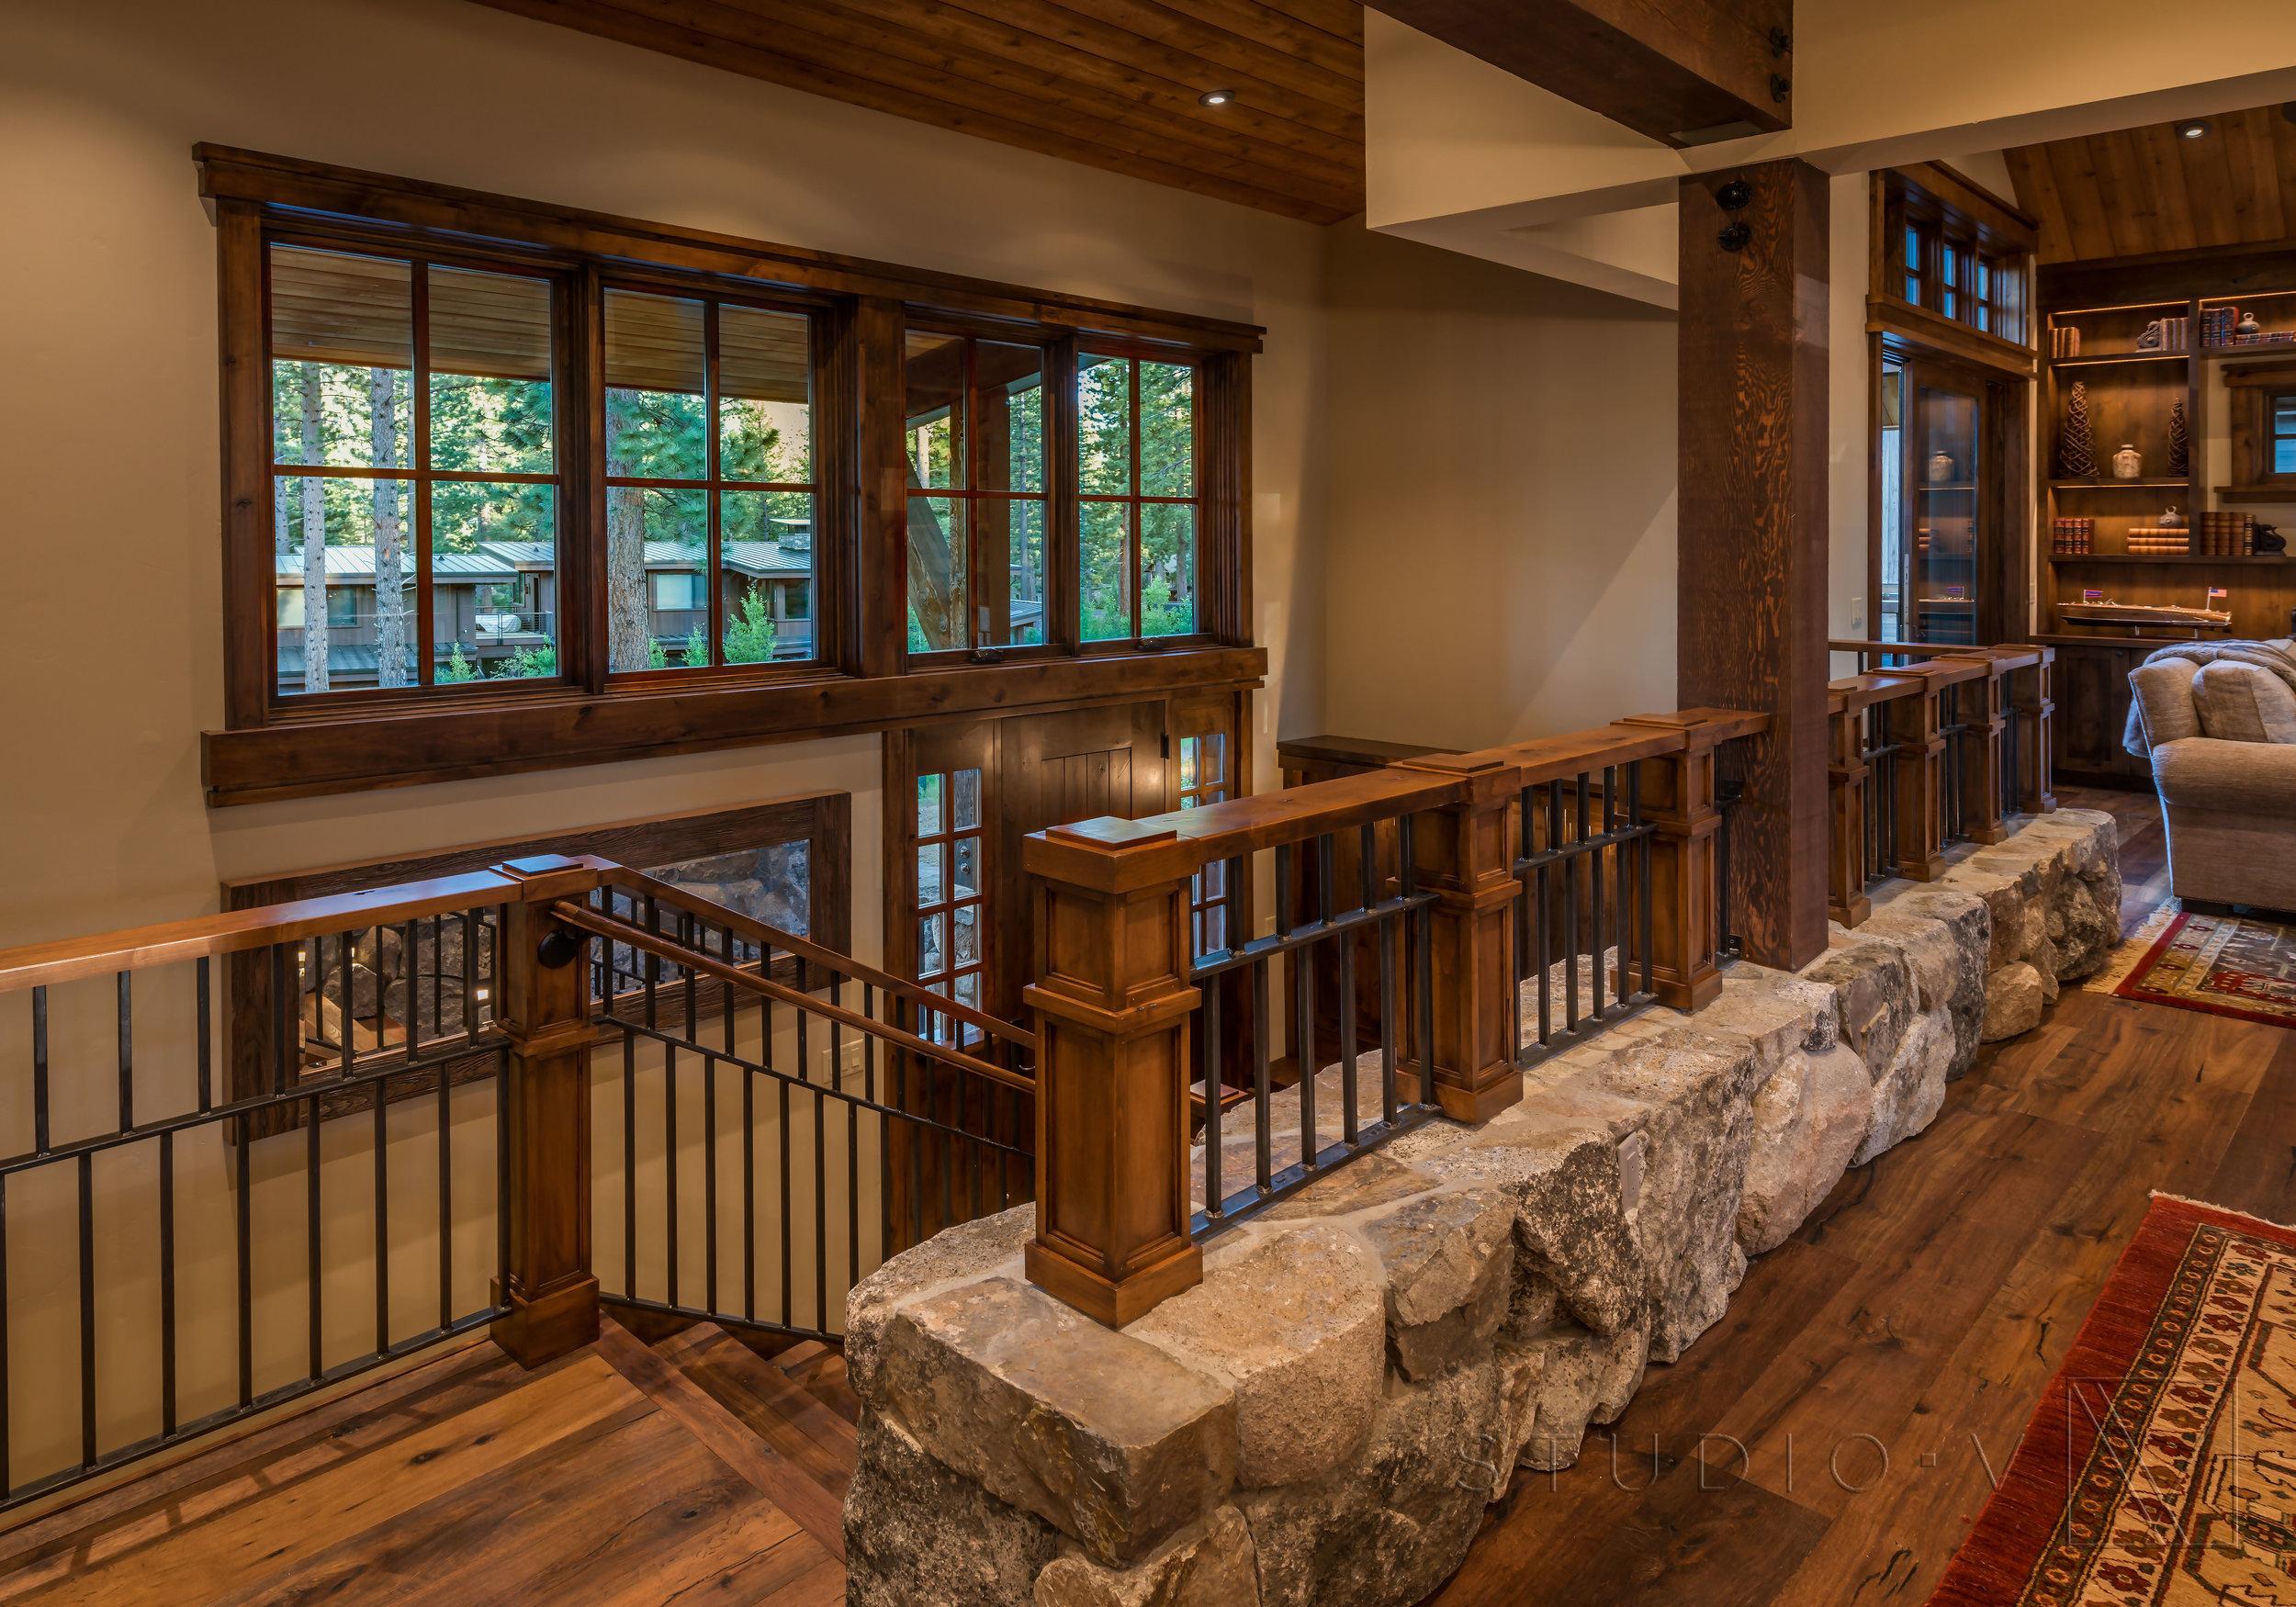 Lodge Cabin Tahoe Truckee Martis Camp CA California Traditional Studio V Interior Architecture Design Scottsdale Arizona AZ (18).jpg